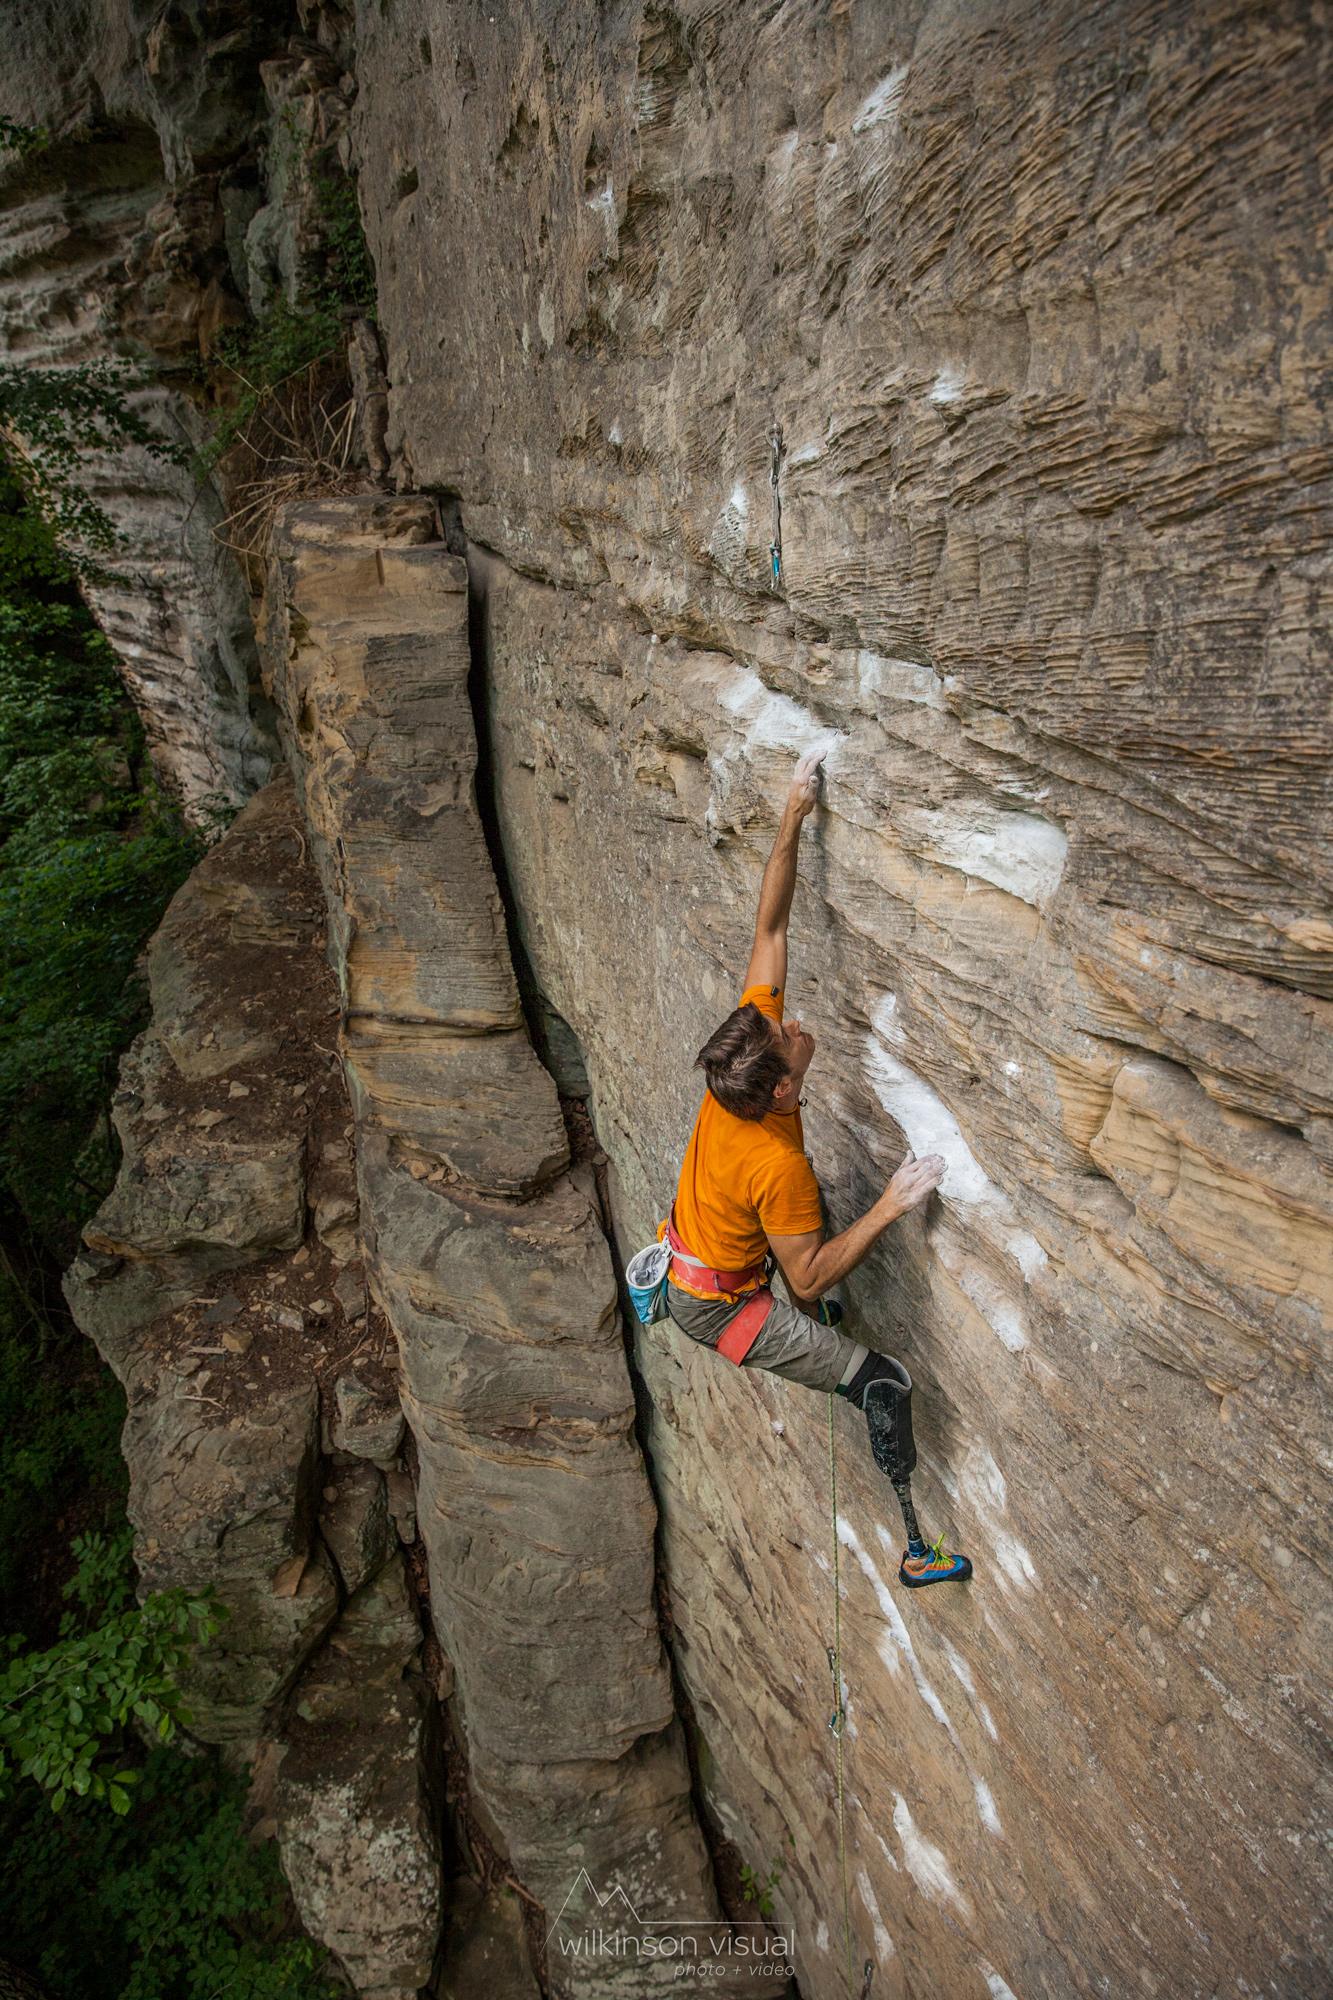 demartino-climbing-9874-Edit.jpg